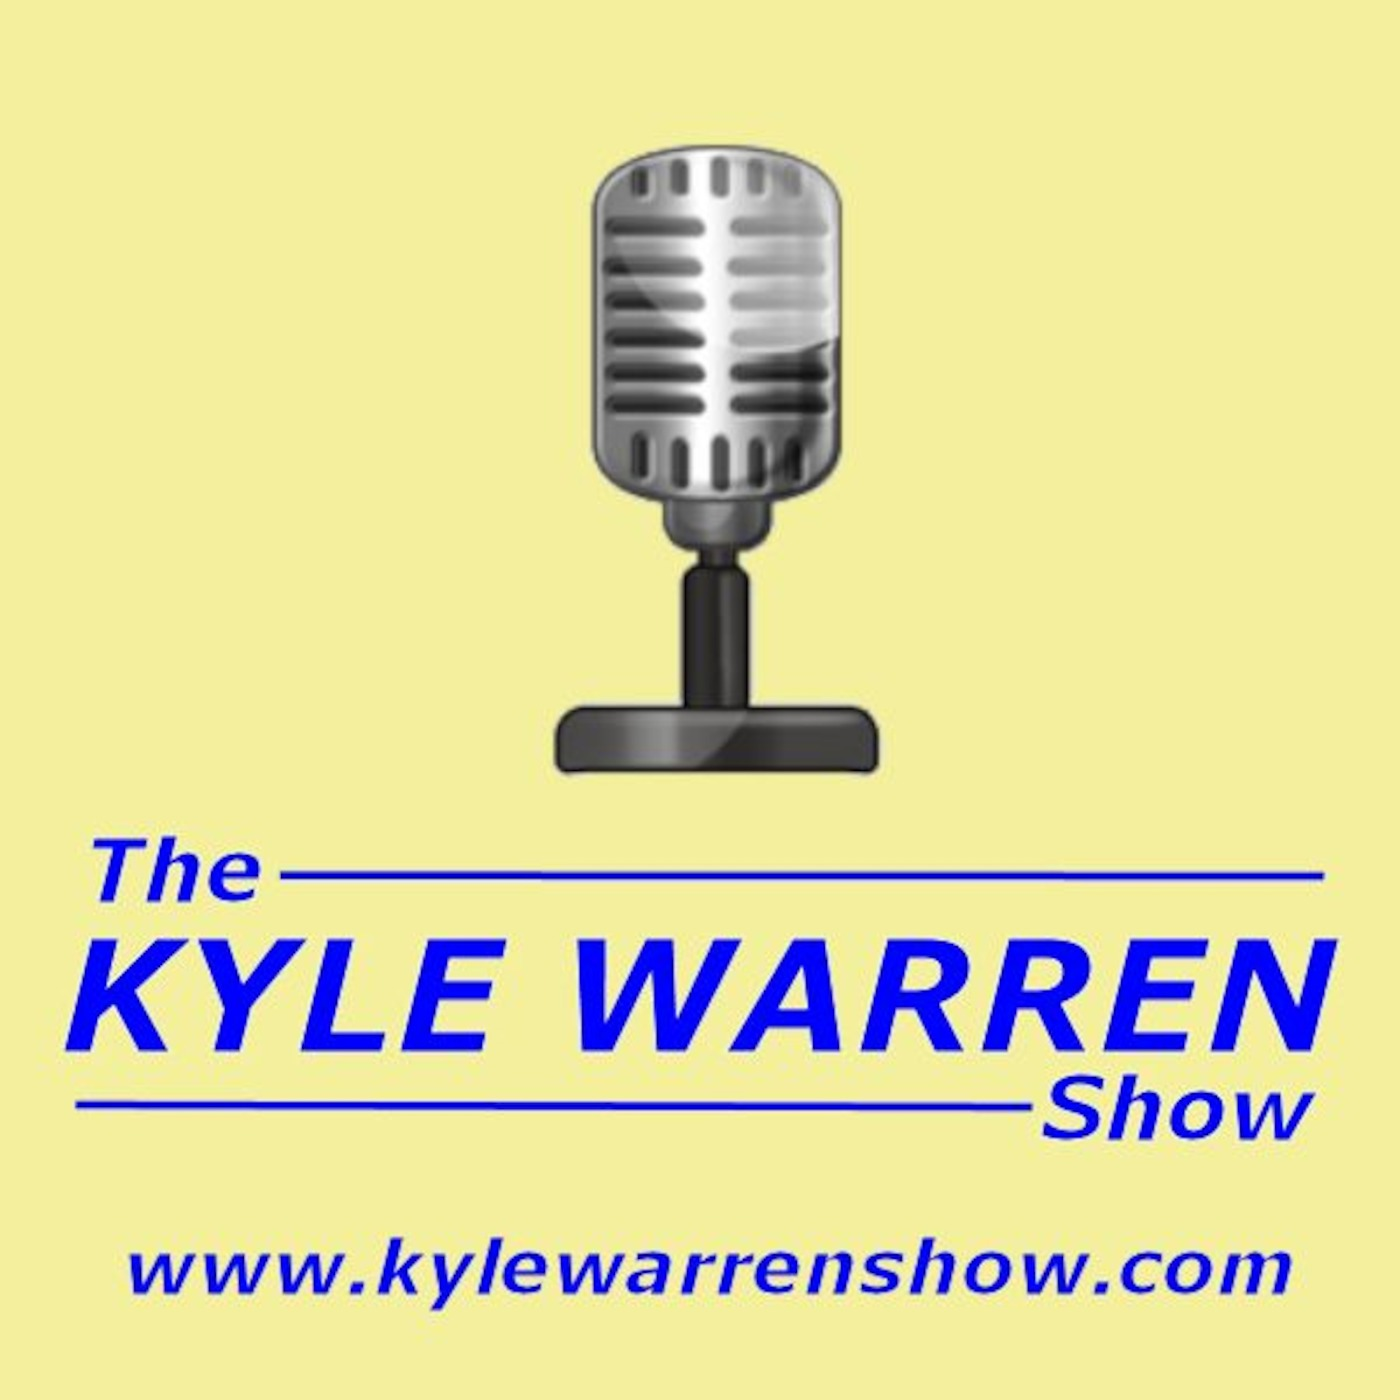 The Kyle Warren Show 12-14-2018